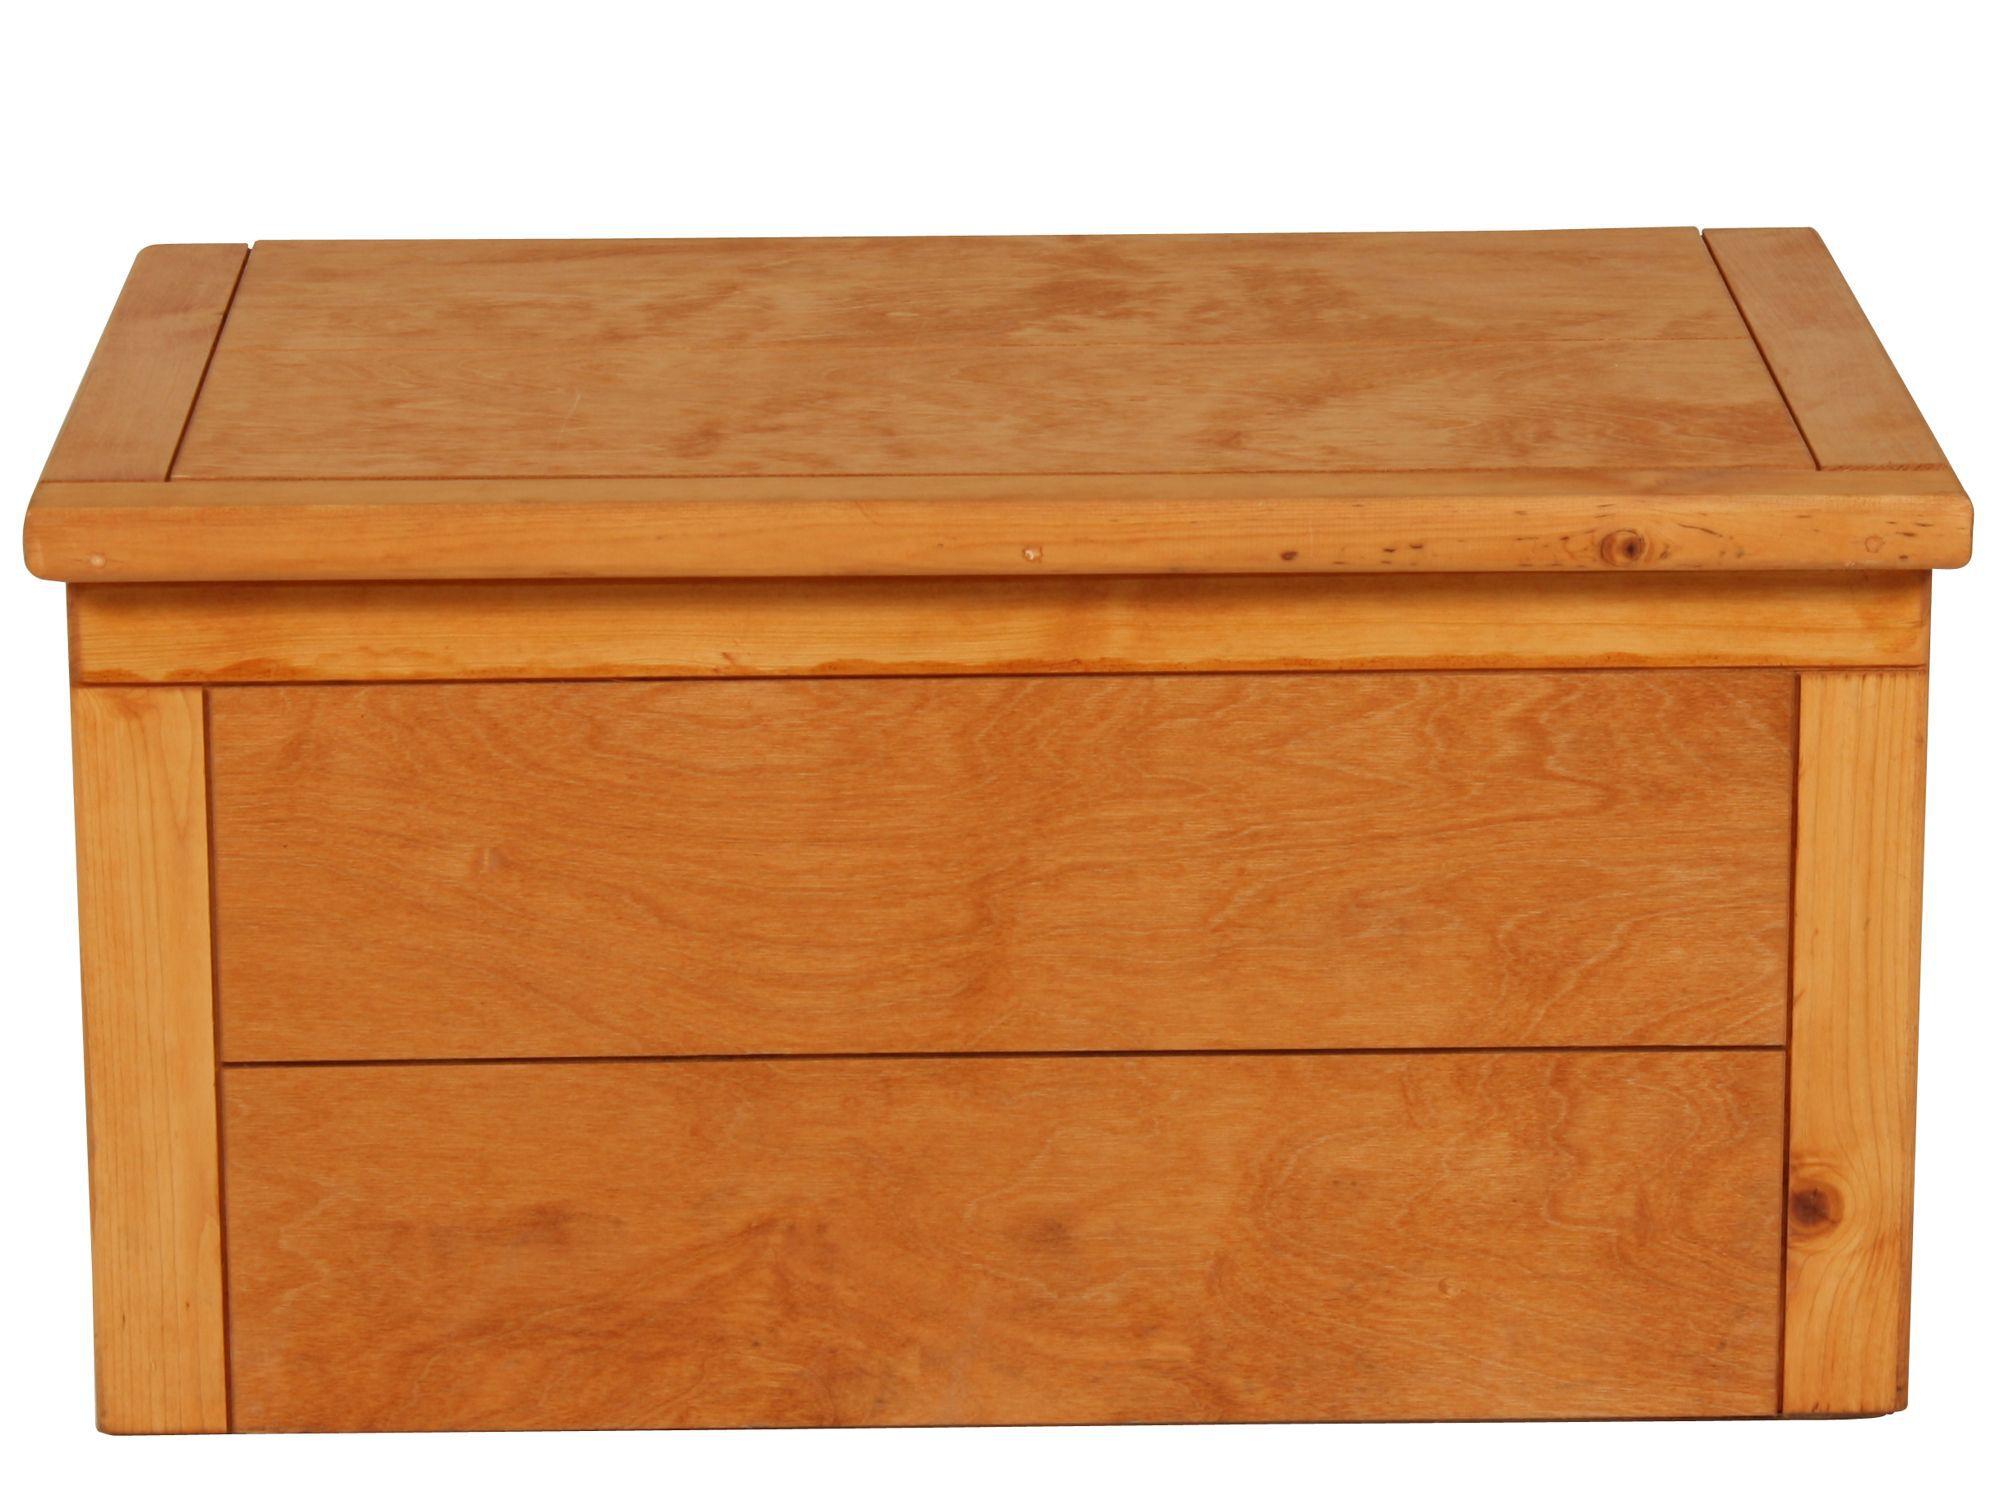 Kids Storage Cube Organizer Toy Box Kids Bedroom Furniture: Solid Pine Toy Chest In Cinnamon